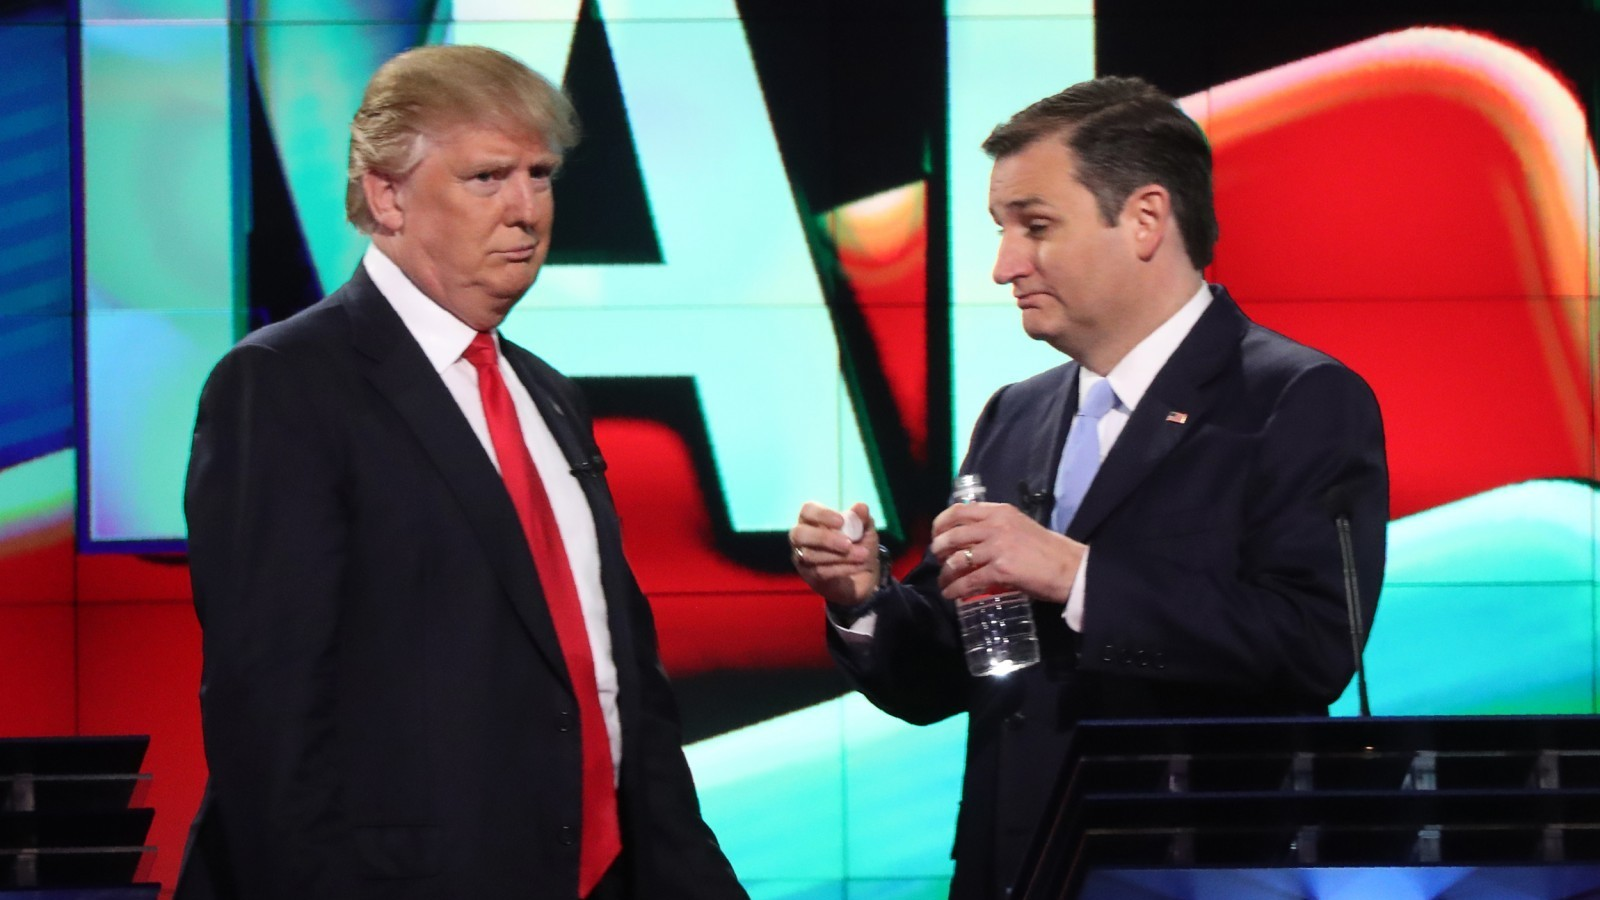 Donald Trump and Ted Cruz.